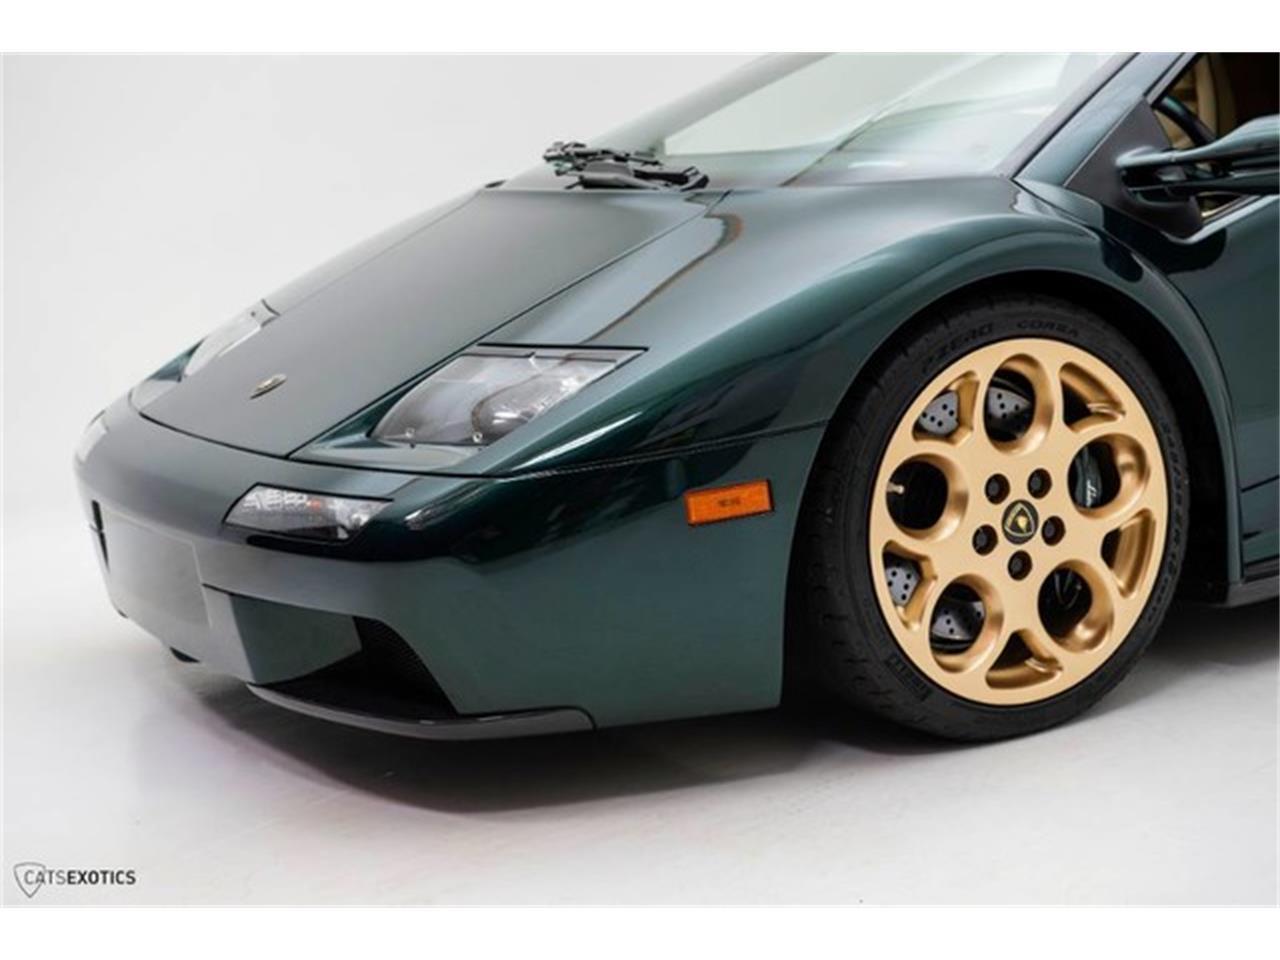 Large Picture of 2001 Lamborghini Diablo located in Washington - $375,000.00 - KWB9